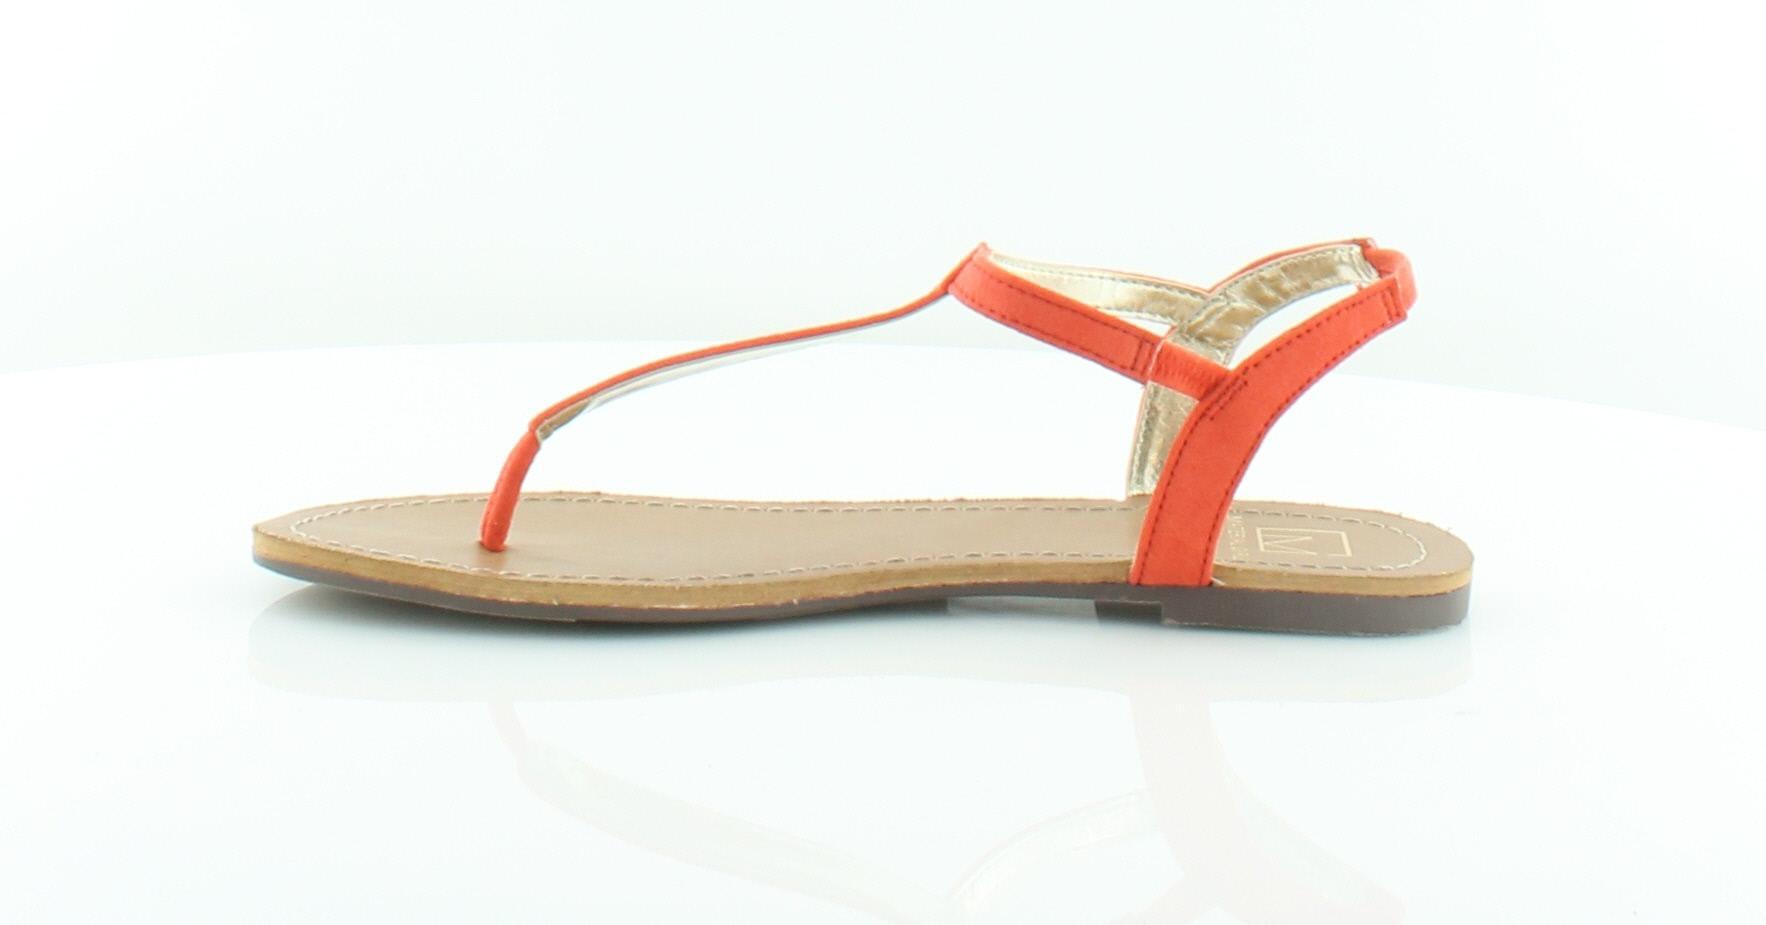 97cf3527700a Material girl sage orange womens shoes size sandals ebay jpg 1766x925 Sage  orange shoes